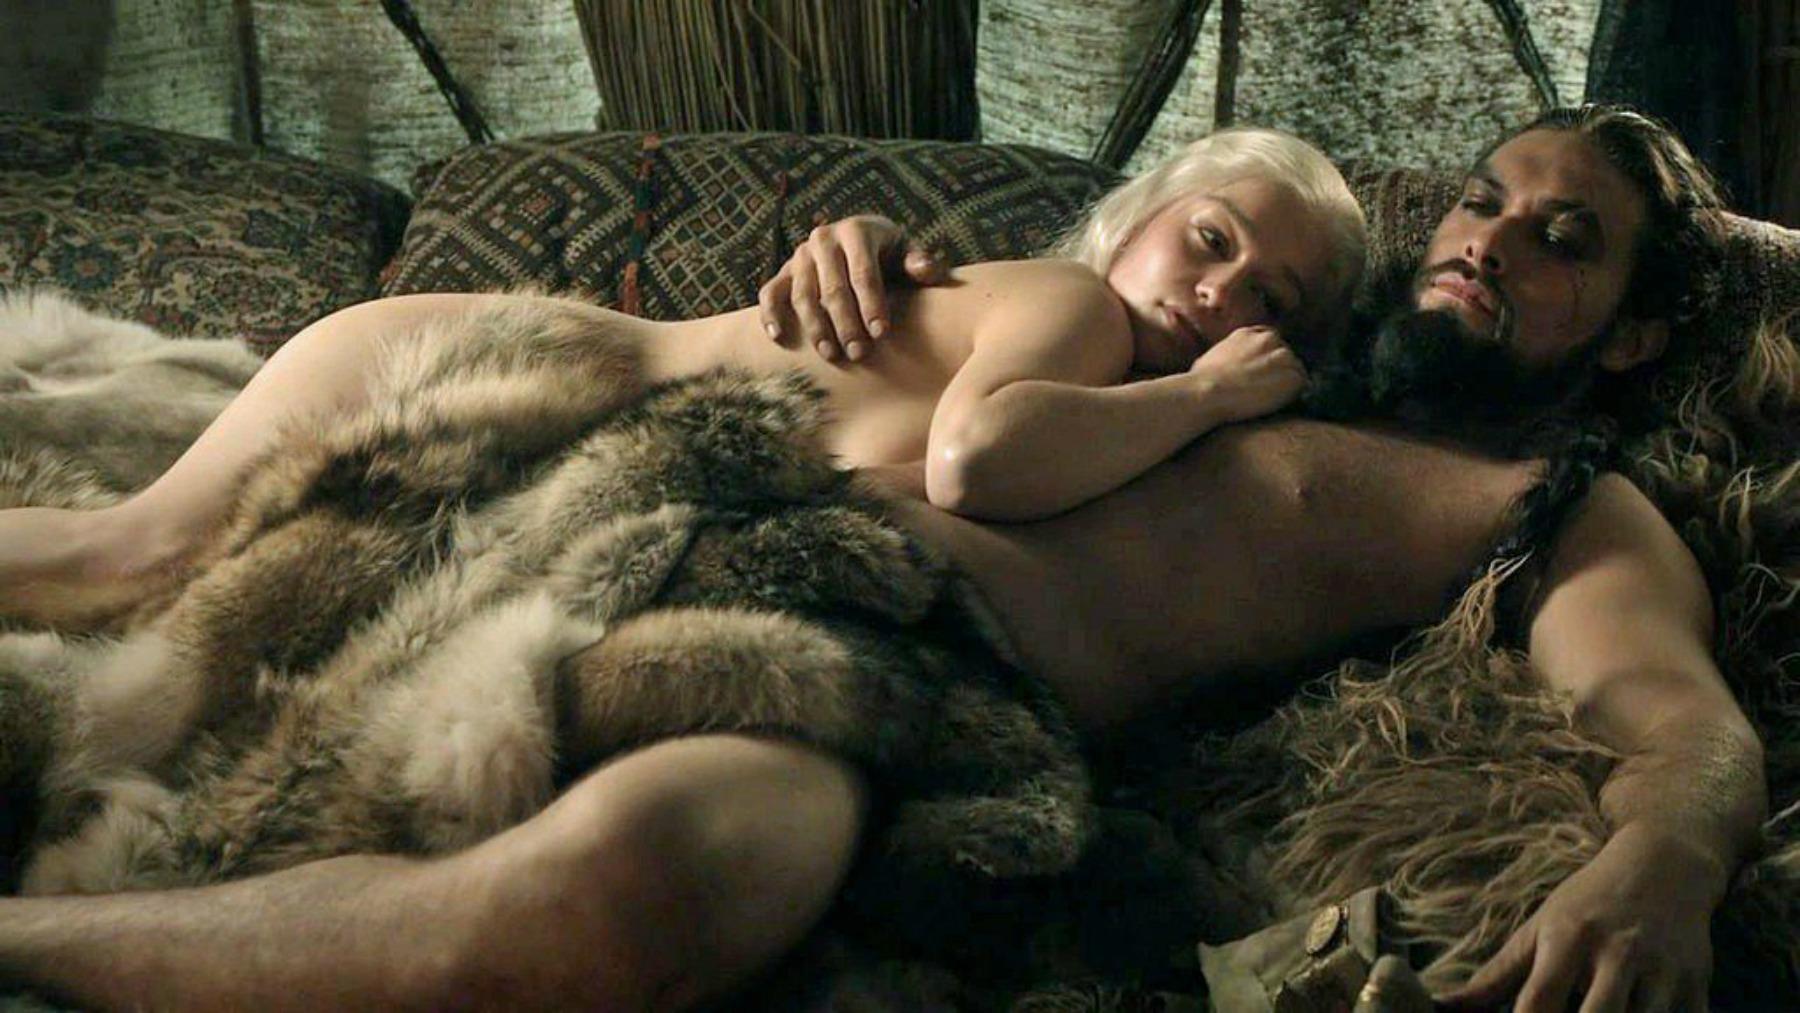 Prvni sex erotika cz